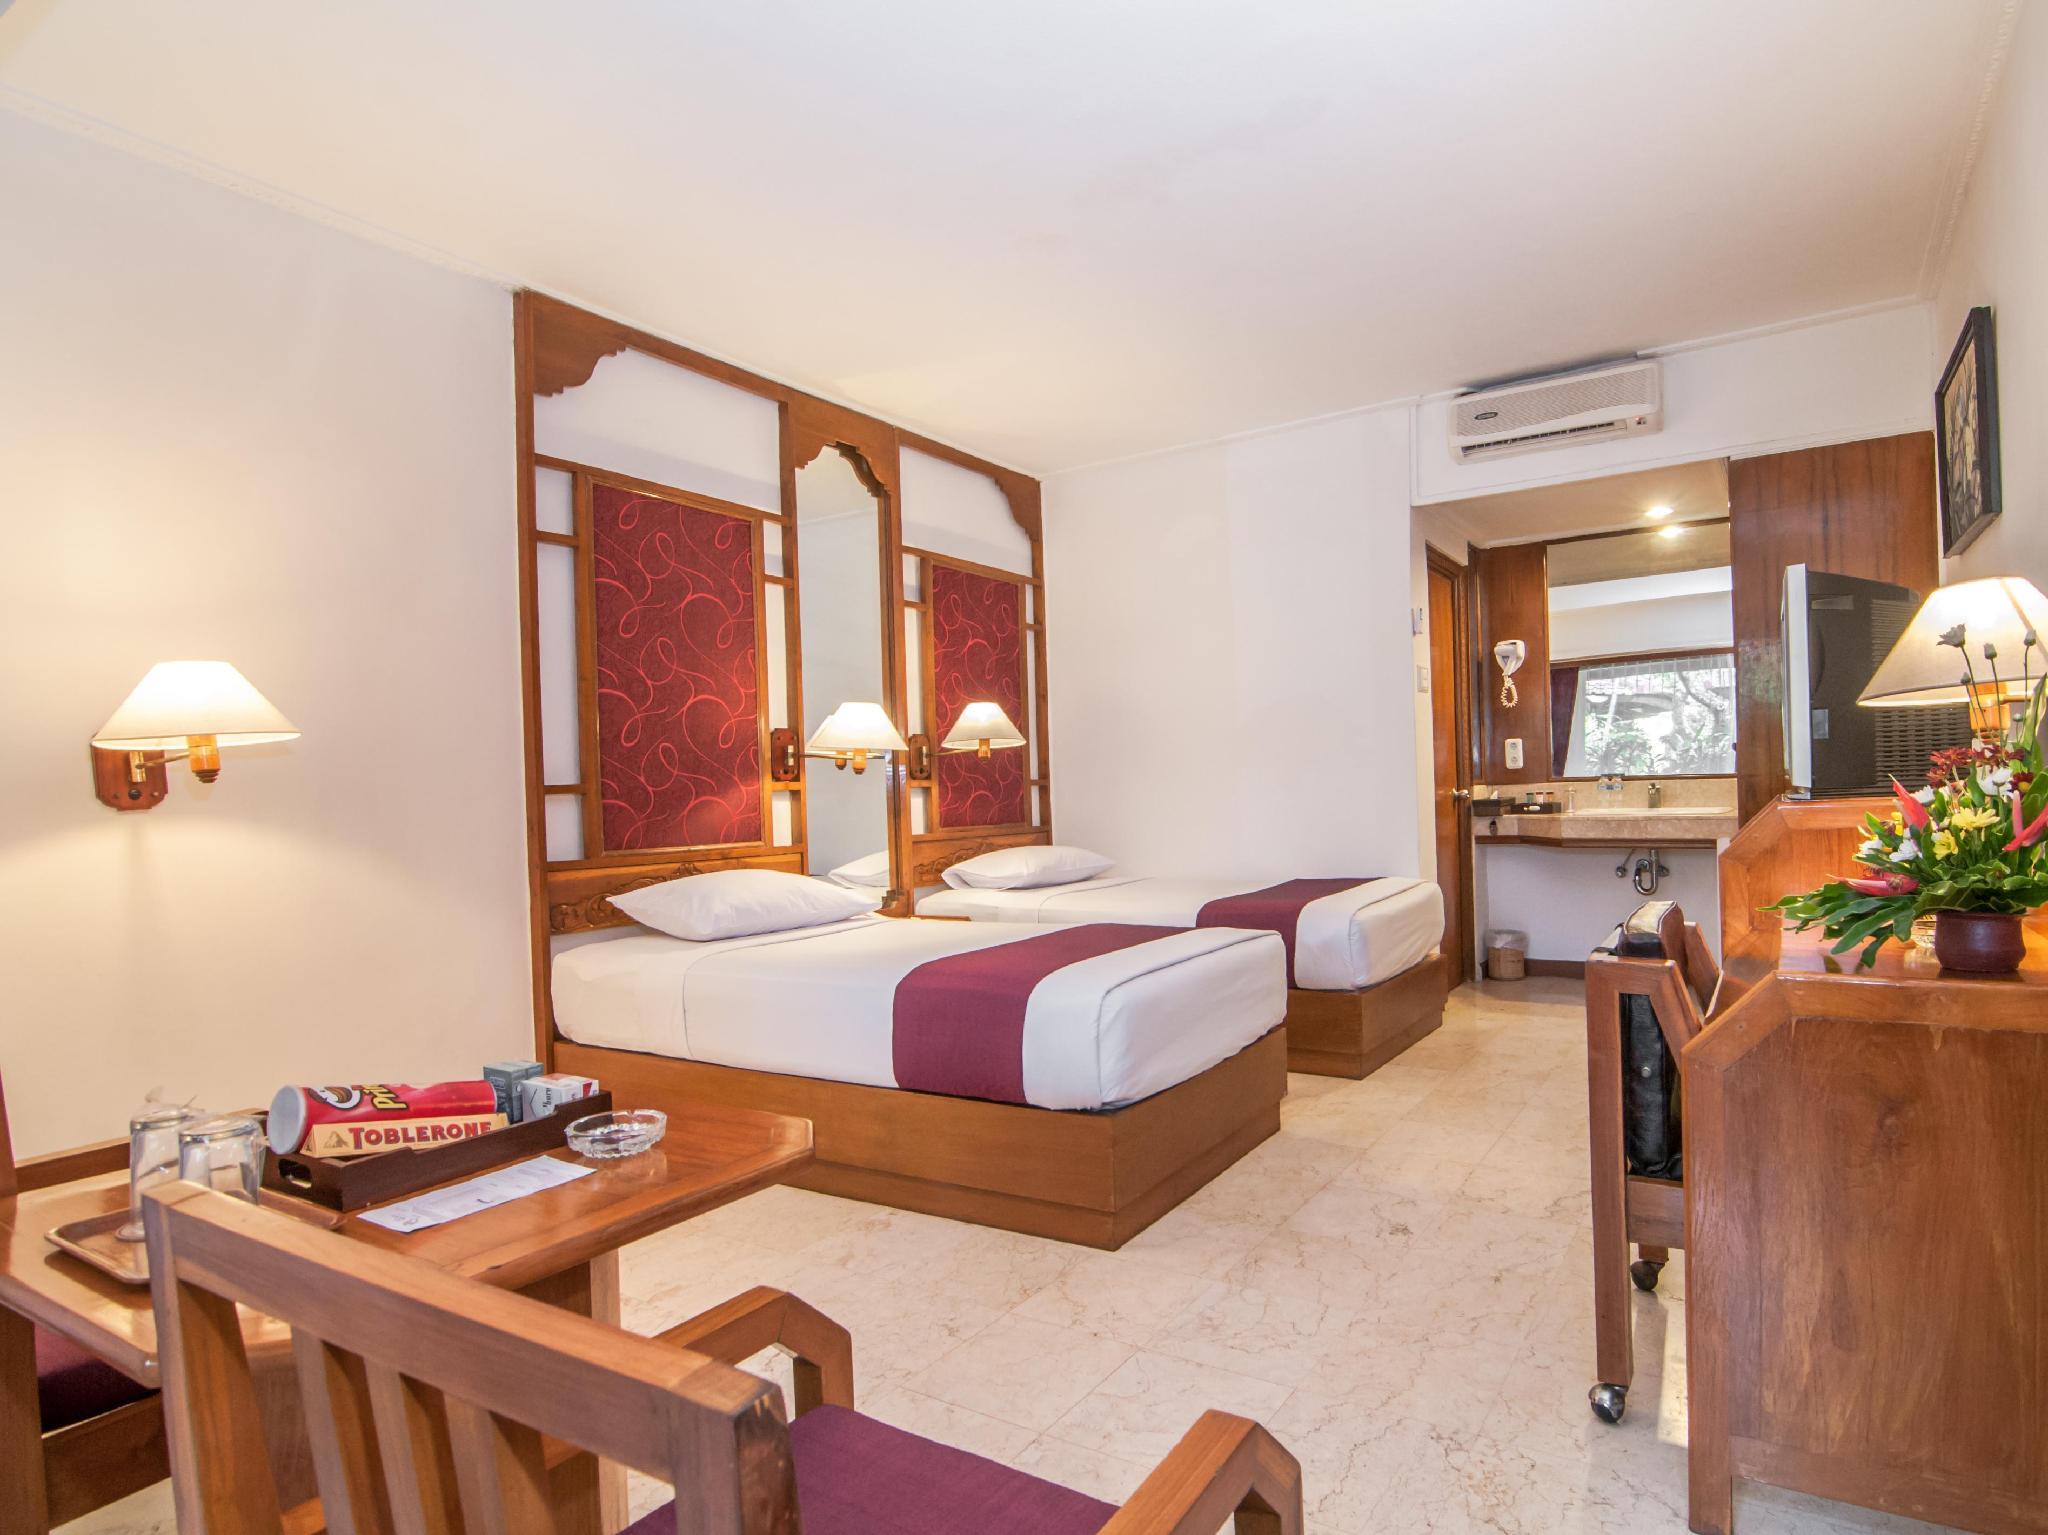 bownty hotel deals